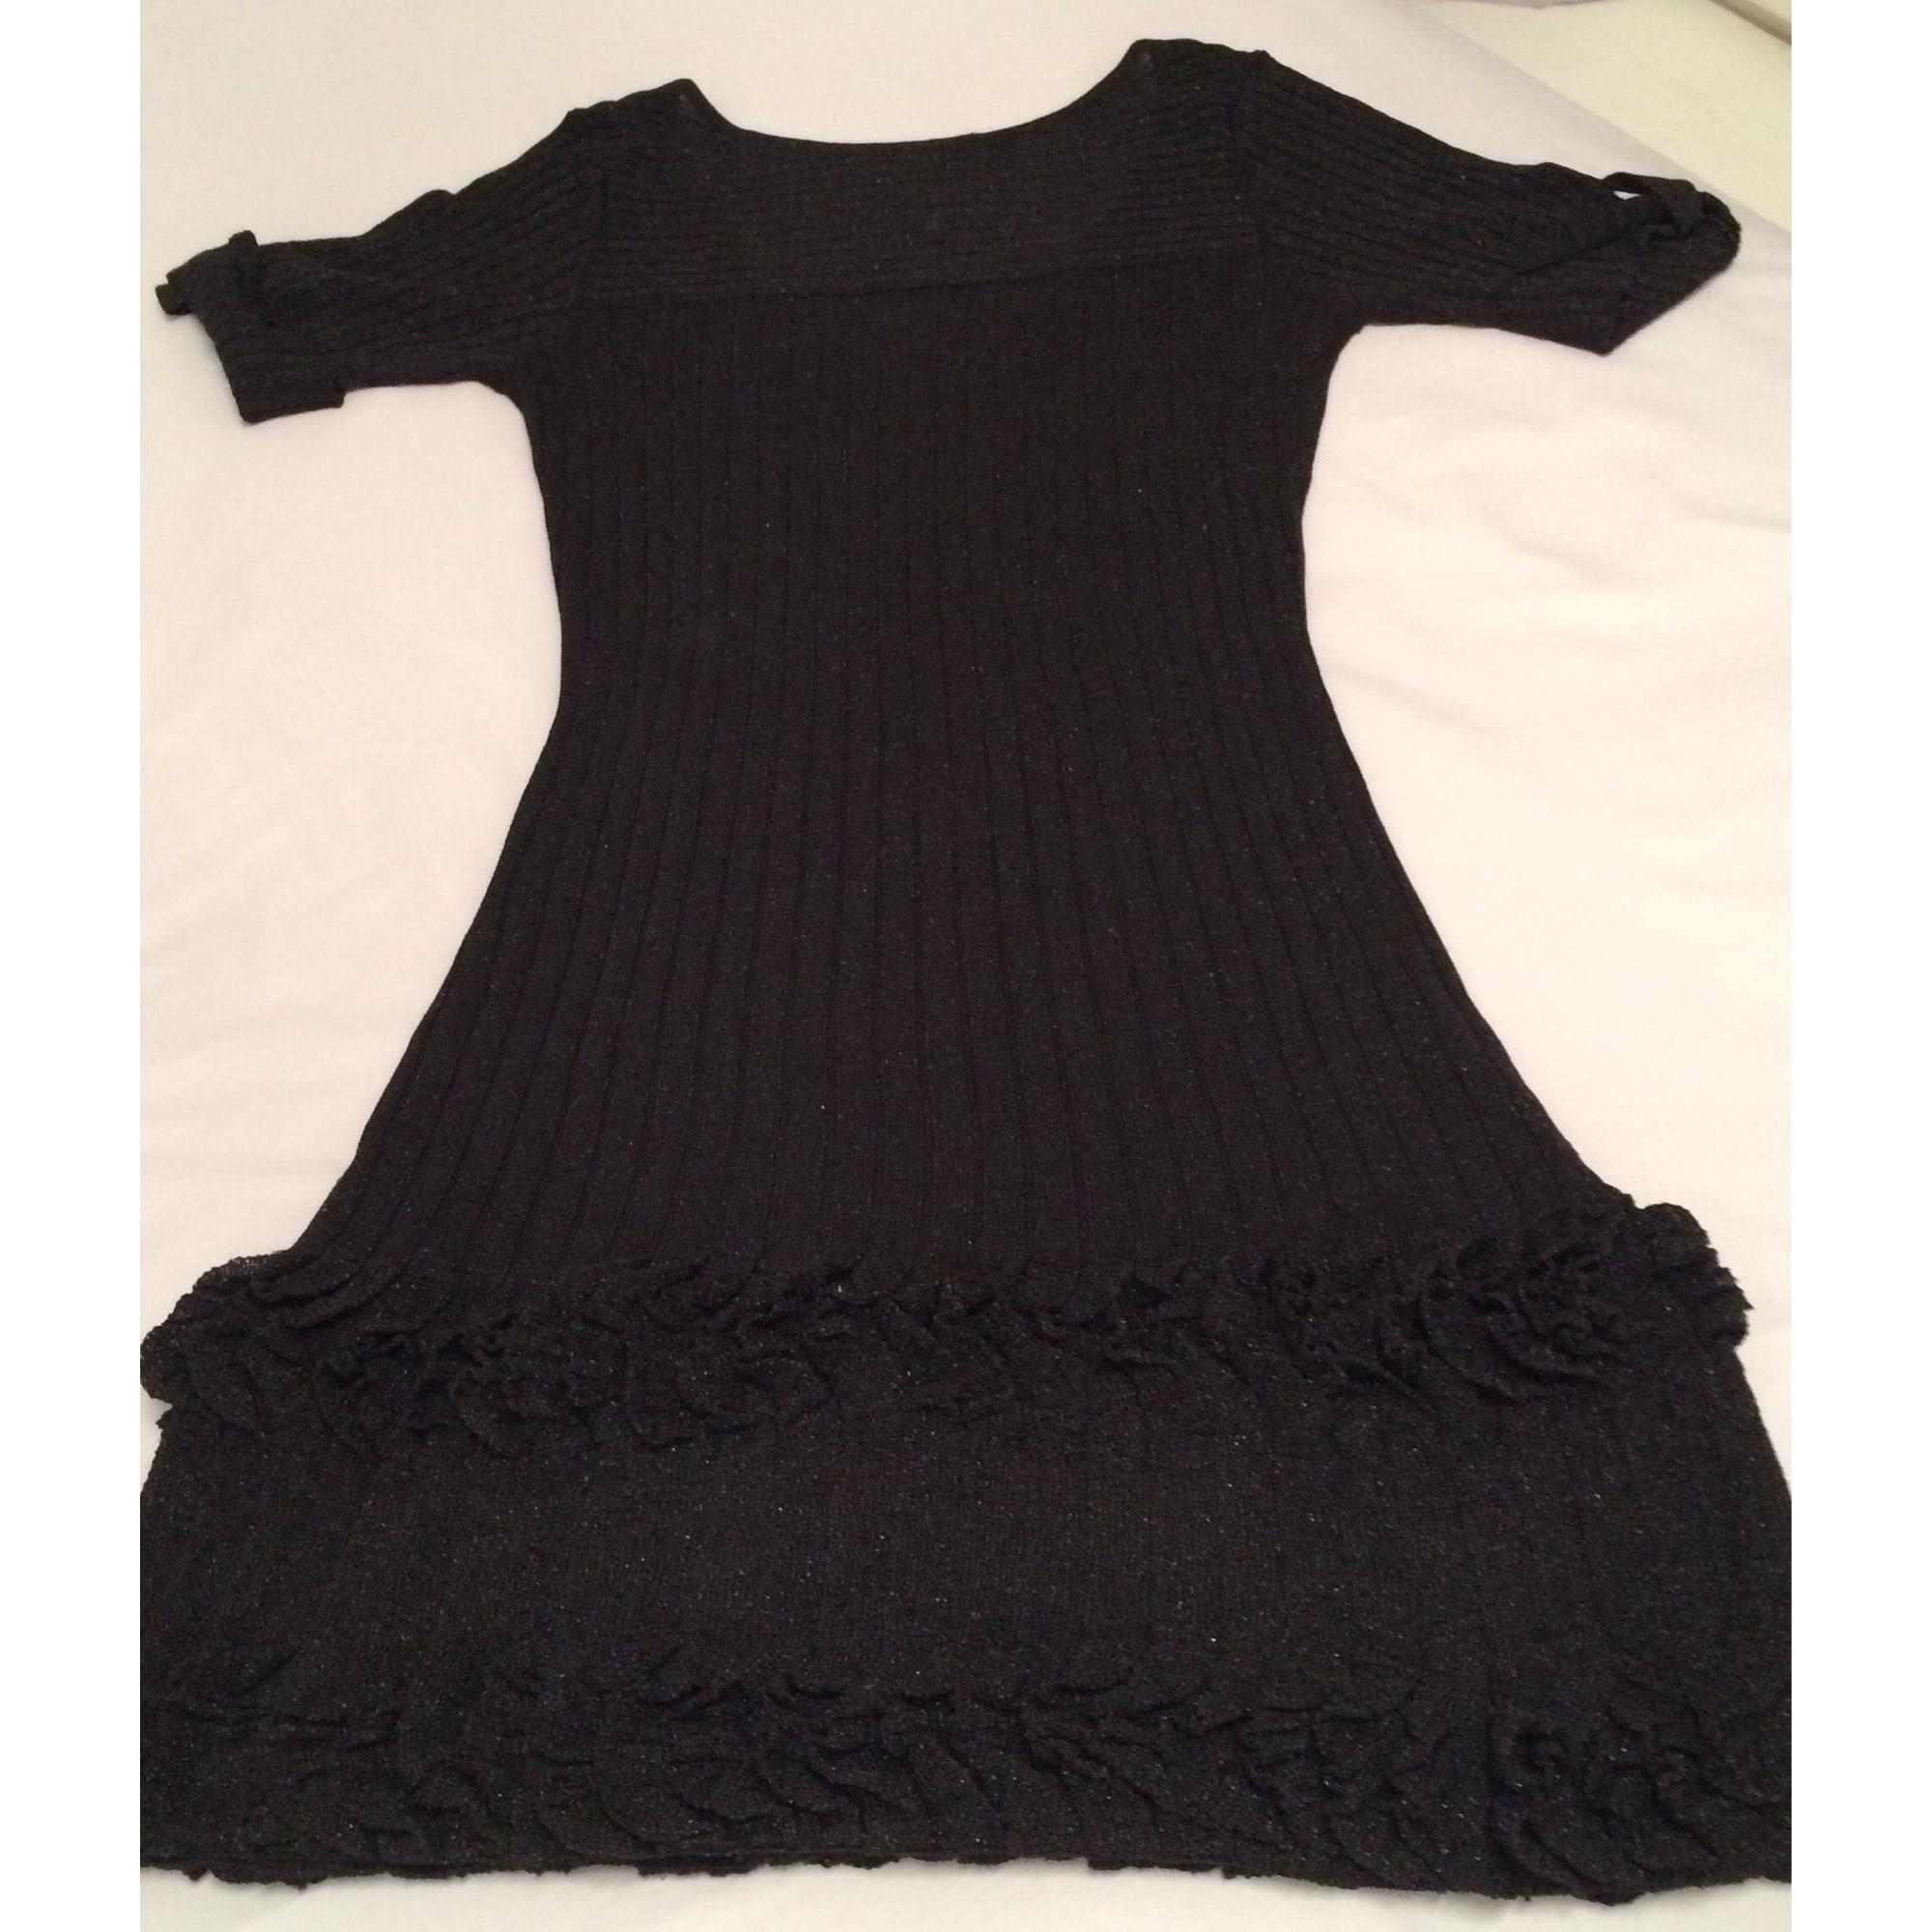 Robe courte viscose polyester noir Synthétique Karen Millen en coloris Noir